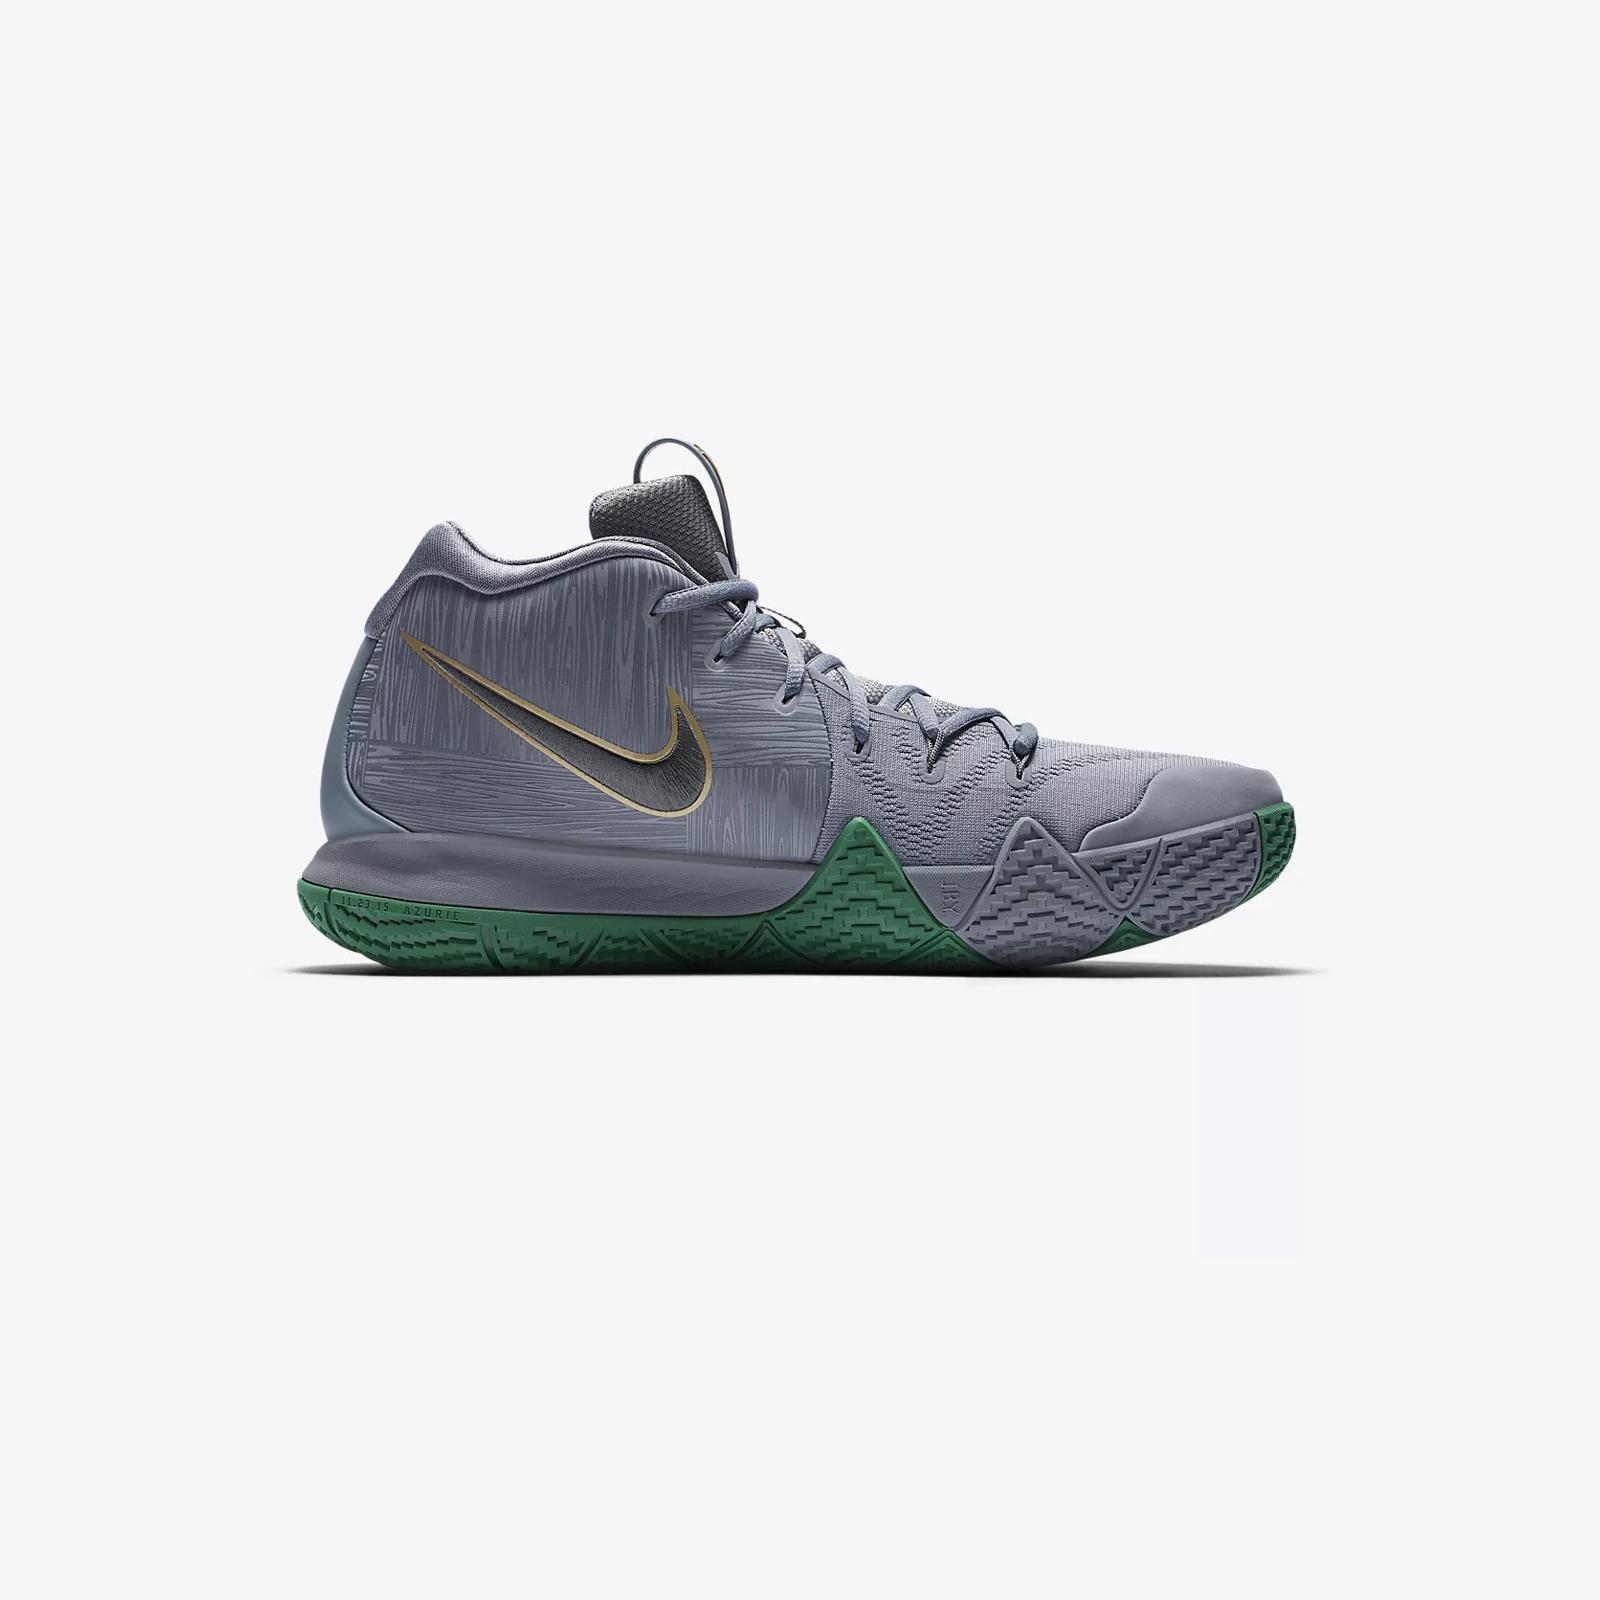 253994a7d966 Nike Kyrie 4 - 943806-001 - Sneakersnstuff